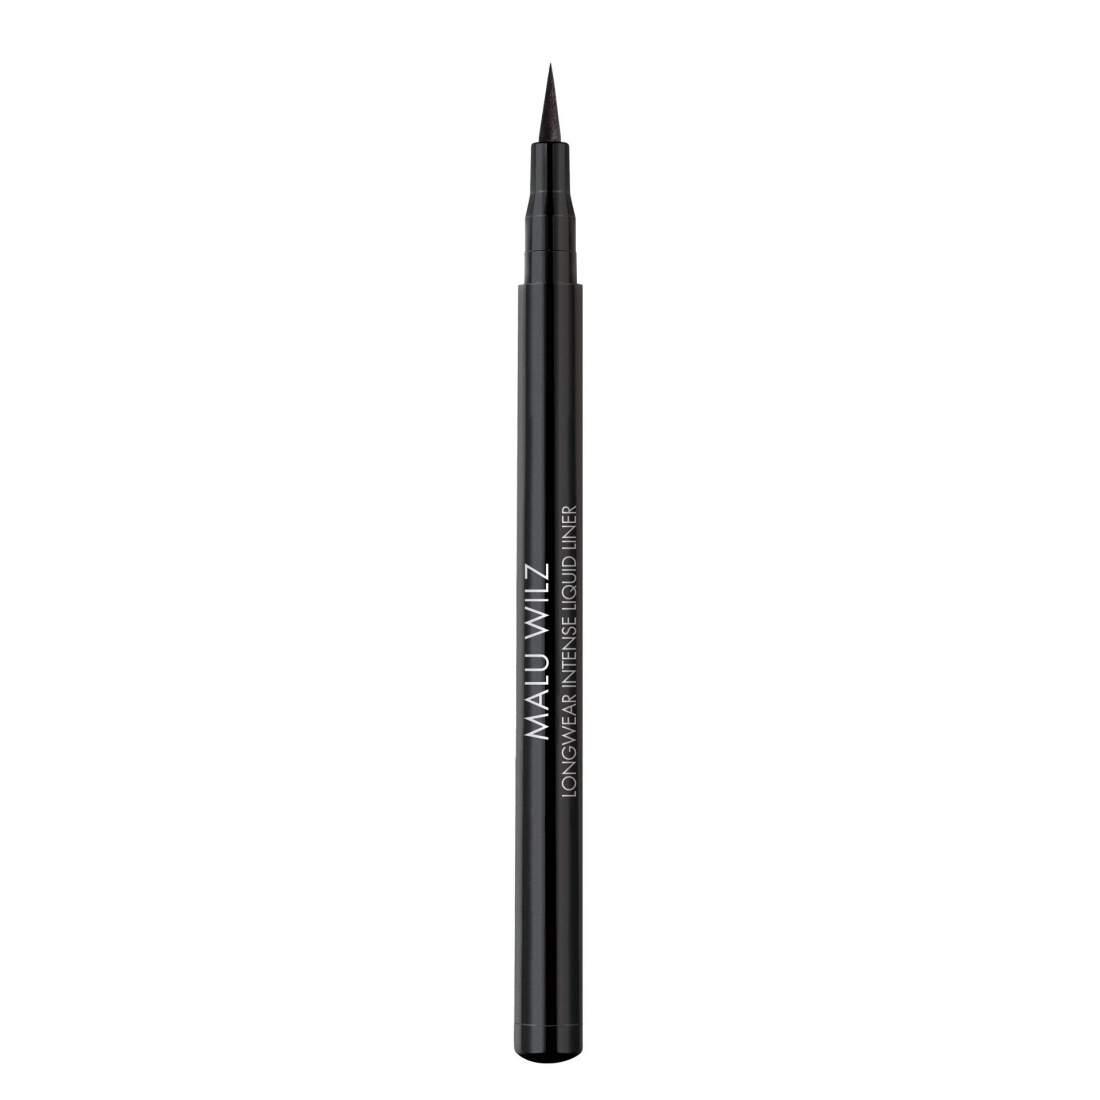 Extra fekete, tartós filces szemhéjtus - Malu Wilz Intense Liqud Liner